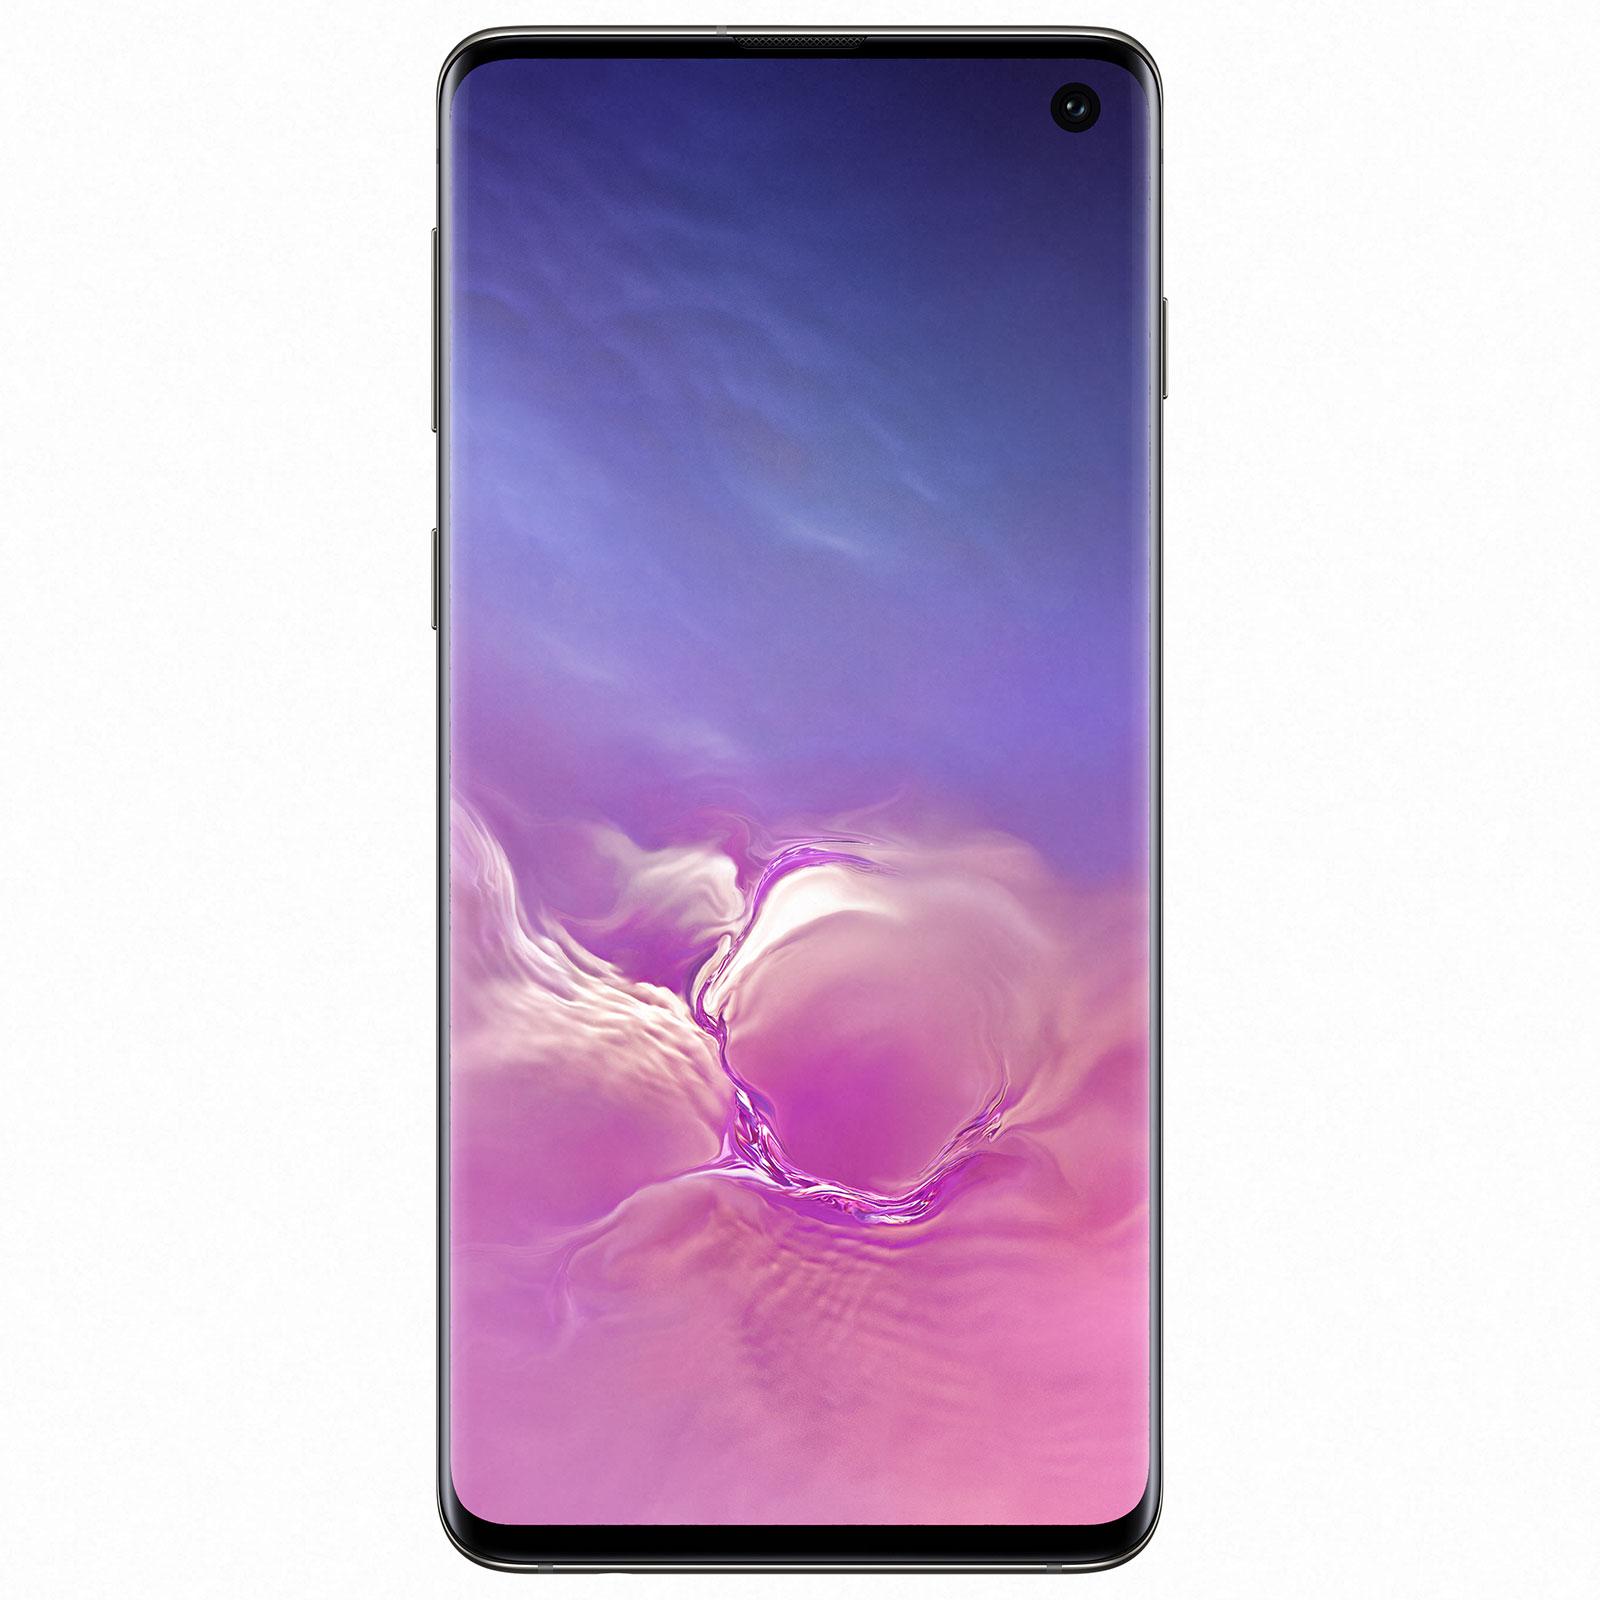 "Mobile & smartphone Samsung Galaxy S10 SM-G973F Noir Prisme (8 Go / 128 Go) Smartphone 4G-LTE Advanced Dual SIM IP68 - Exynos 9820 8-Core 2.8 GHz - RAM 8 Go - Ecran tactile Super AMOLED 6.1"" 1440 x 3040 - 128 Go - NFC/Bluetooth 5.0 - 3400 mAh - Android 9.0"